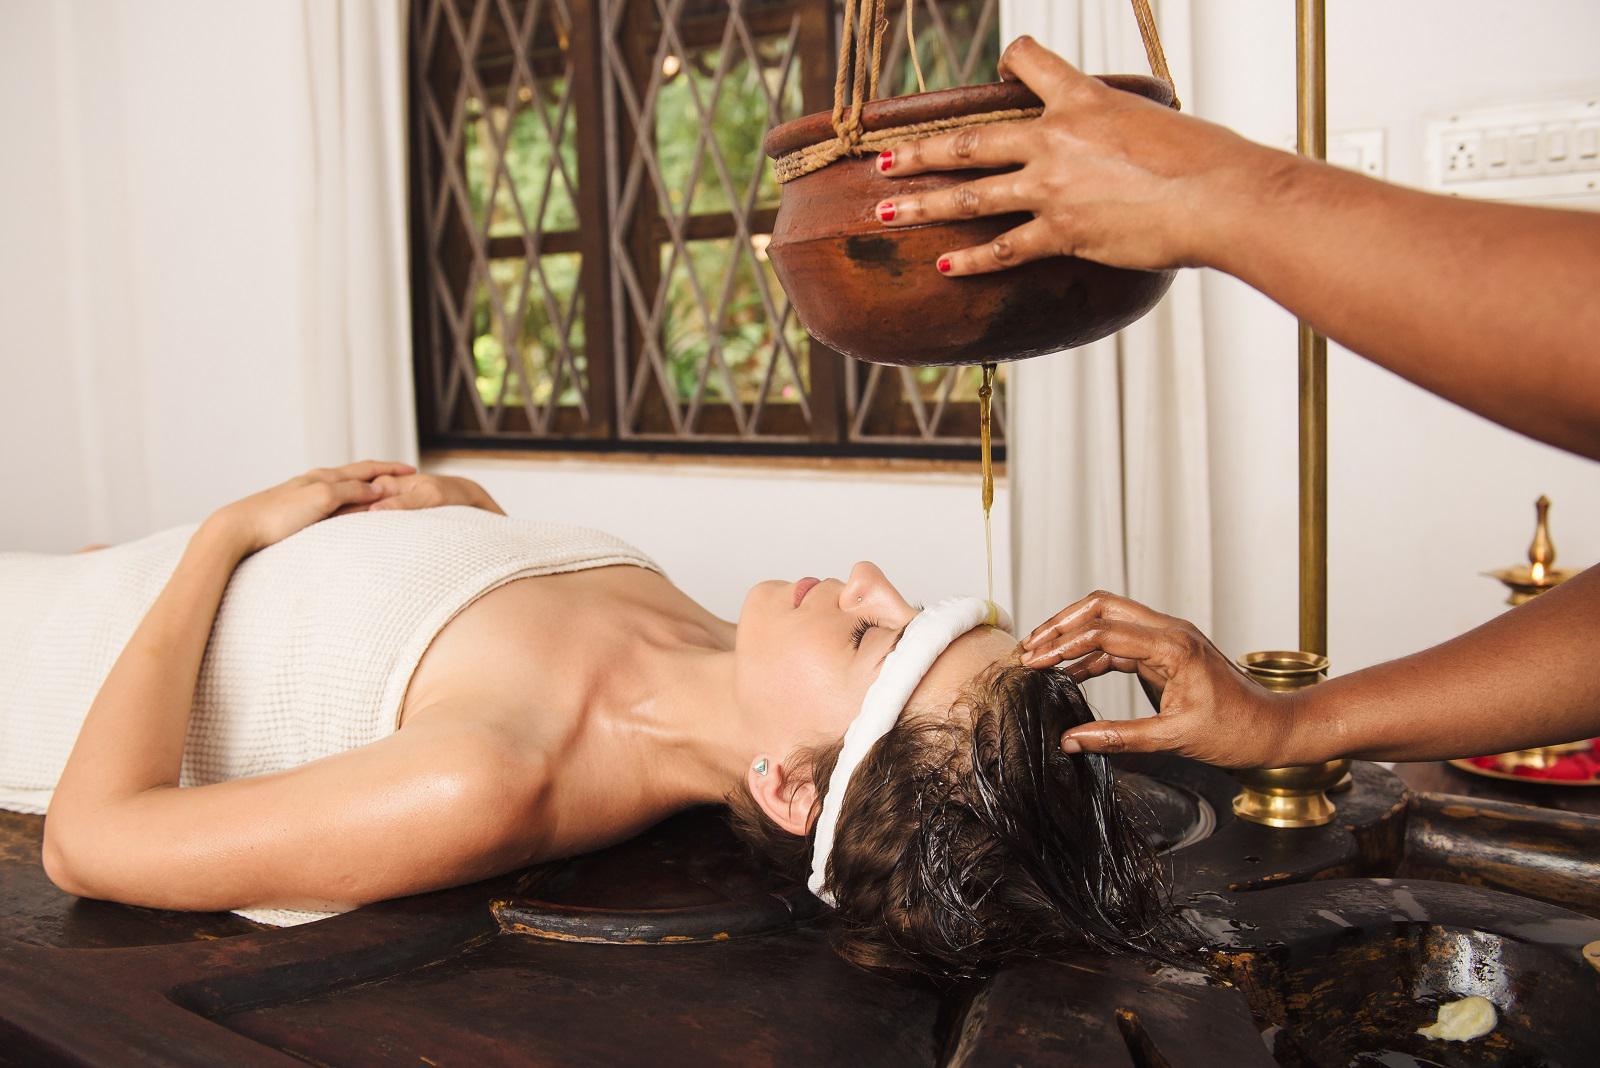 woman having Ayurveda shirodhara treatment in India